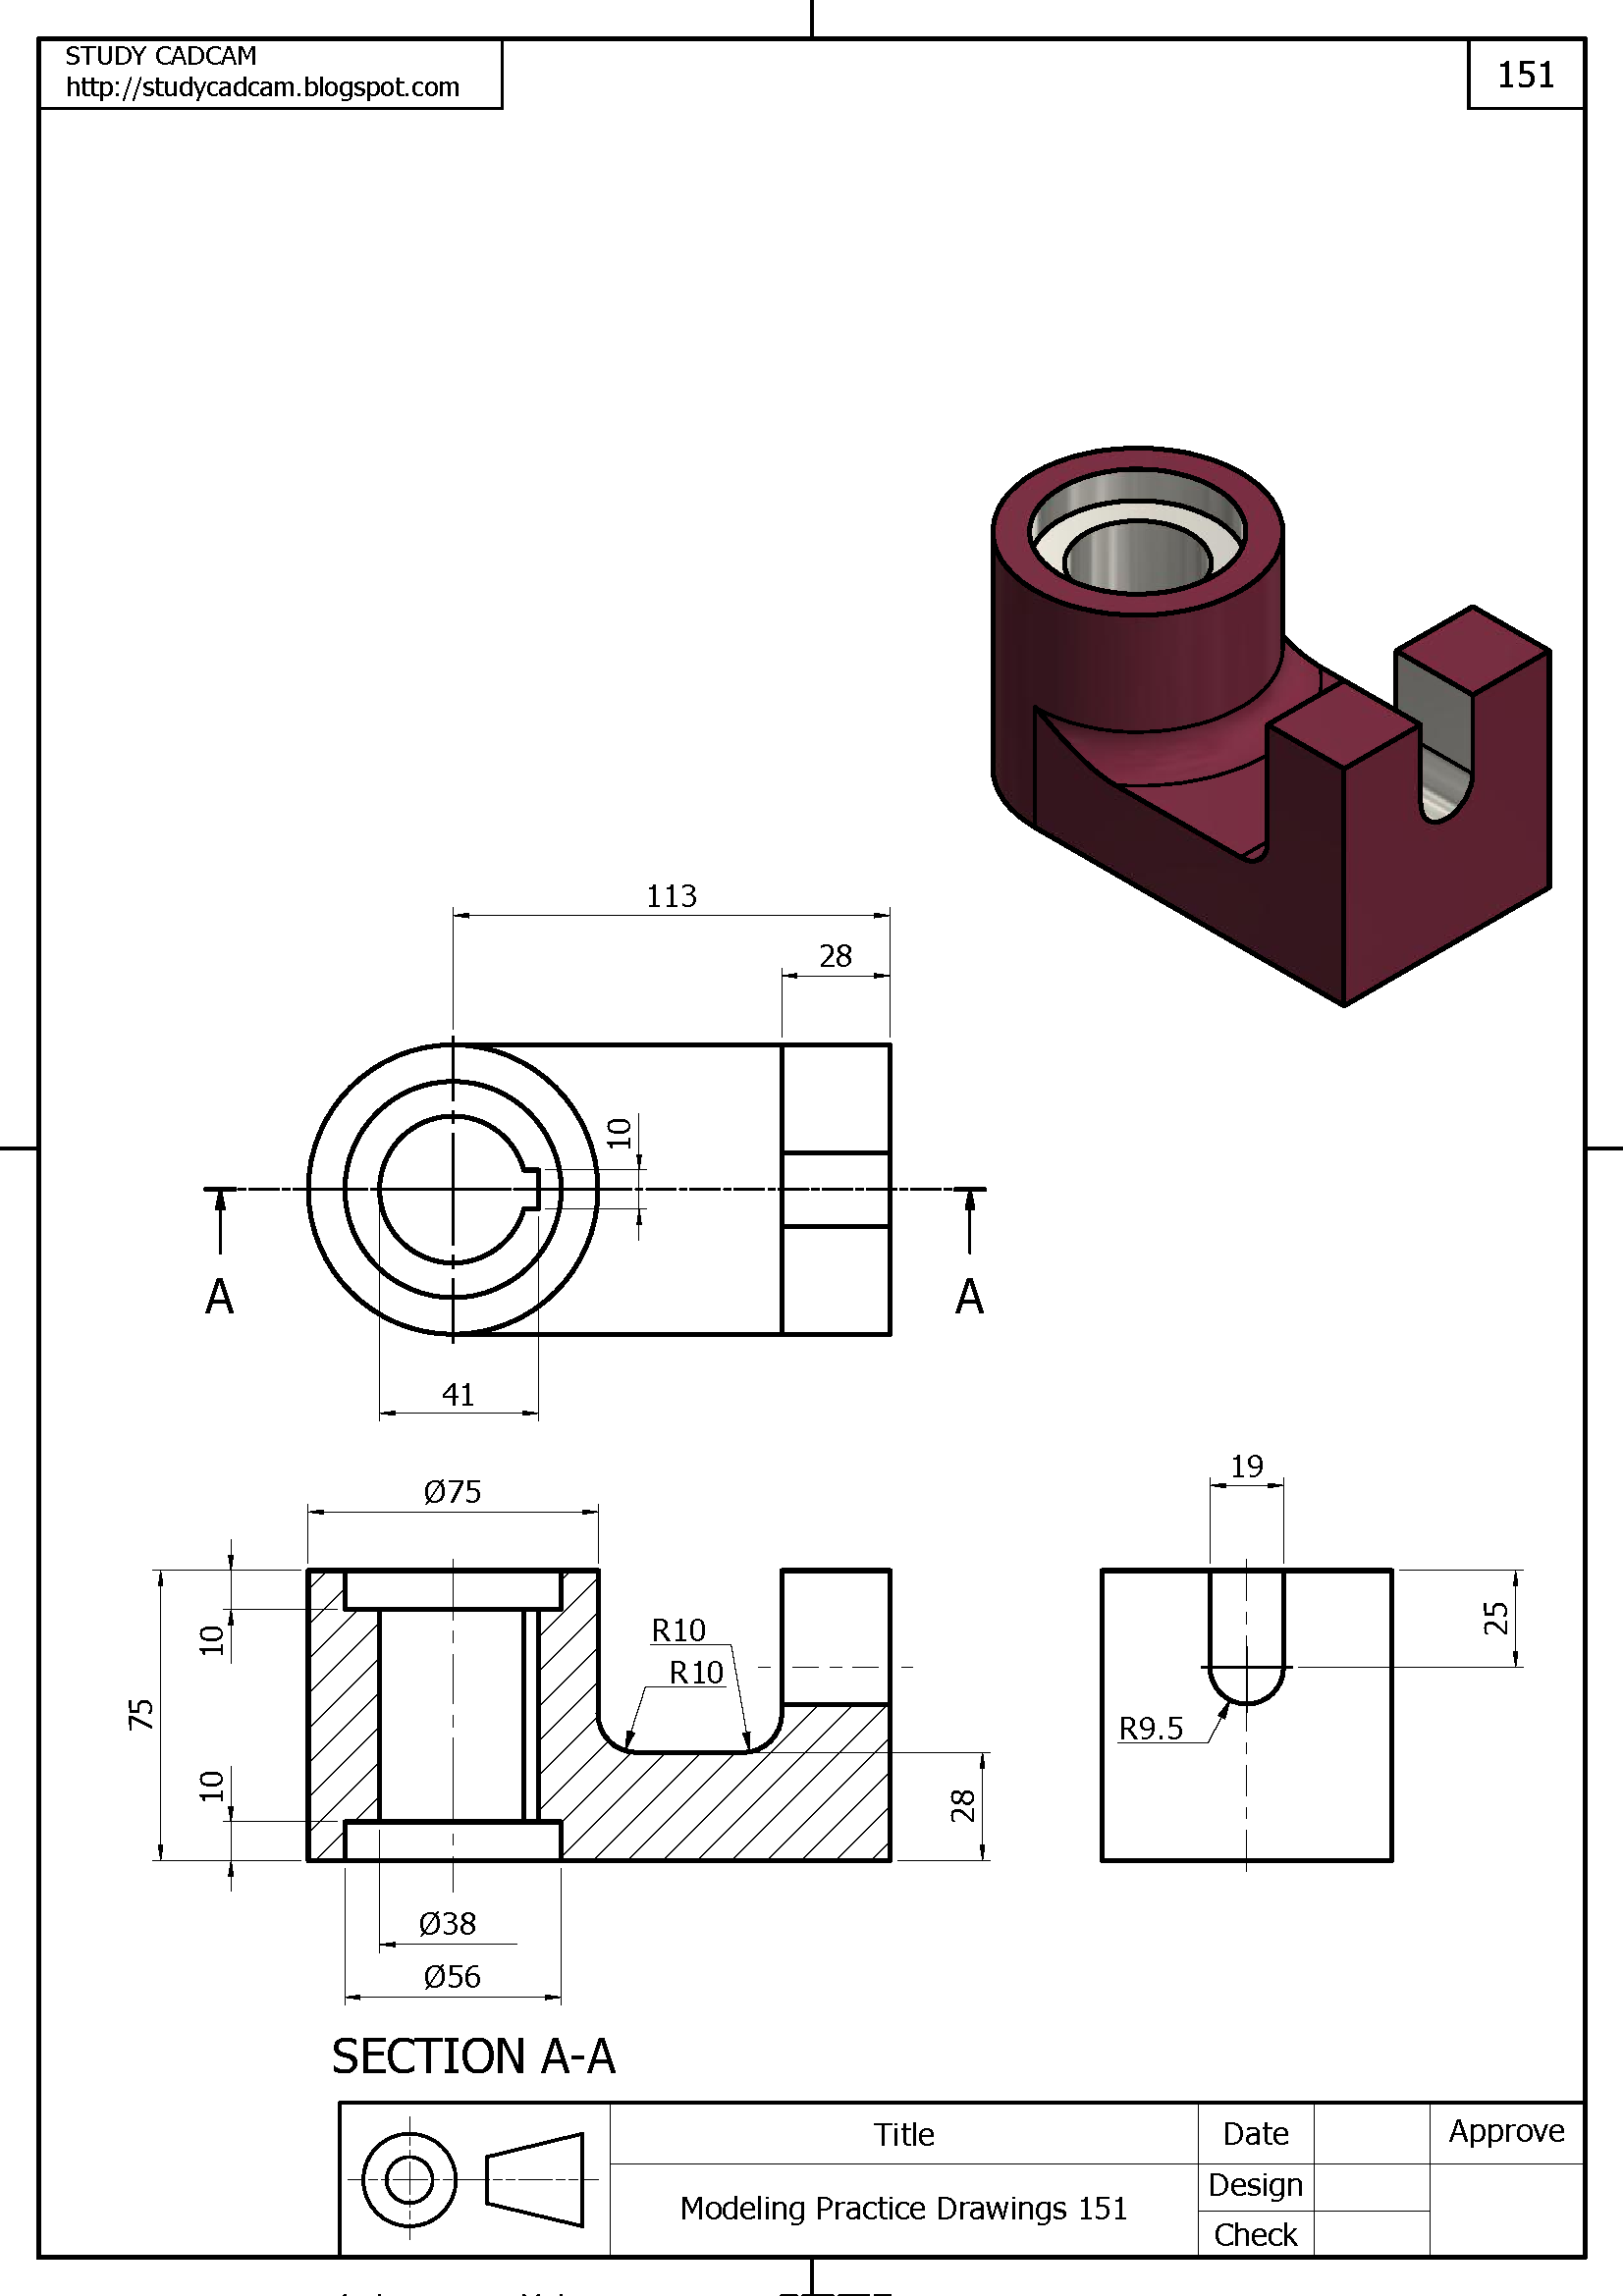 pin by kemal berkay a ala k on solidworks pinterest drawings 3d